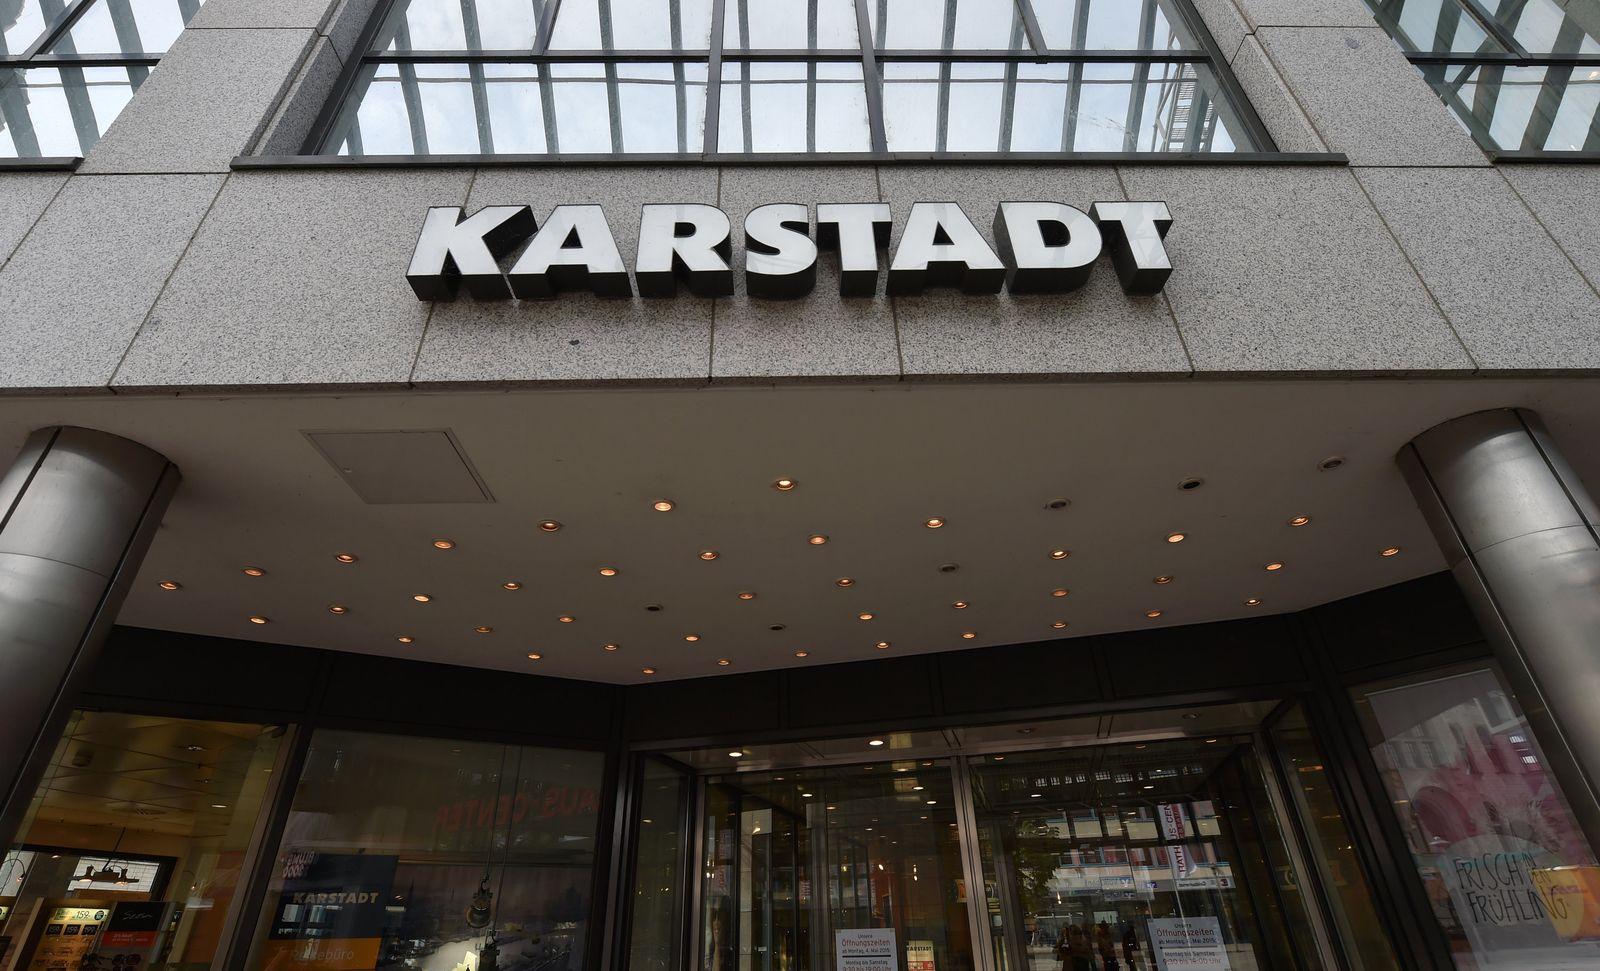 Karstadt Warenhaus - Dessau